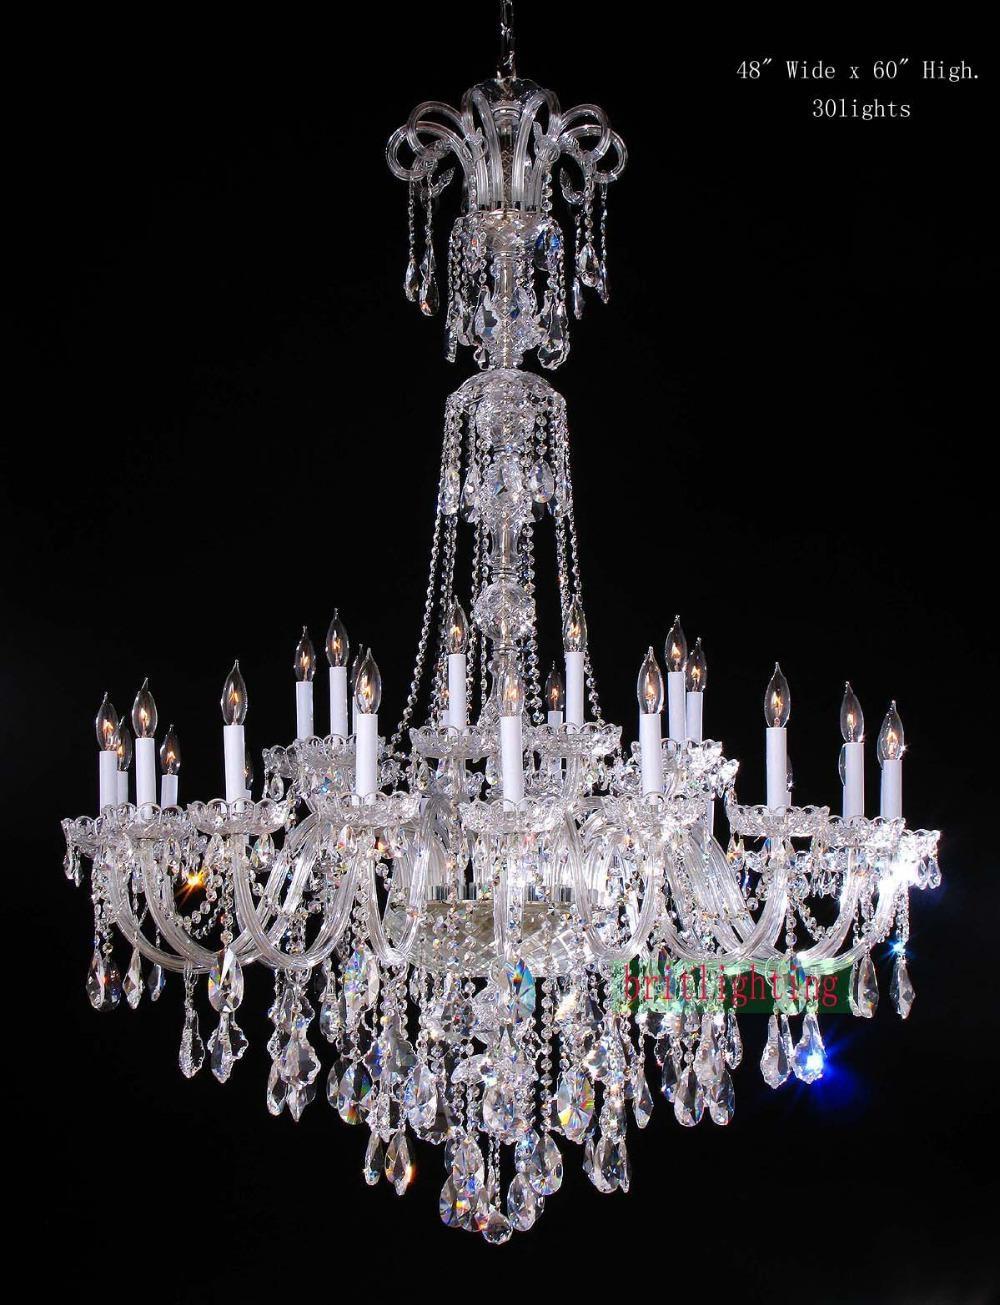 Lamp Modern Crystal Chandeliers 5 Star Hotel Chandelier Led Pertaining To Crystal Chandeliers (#9 of 12)